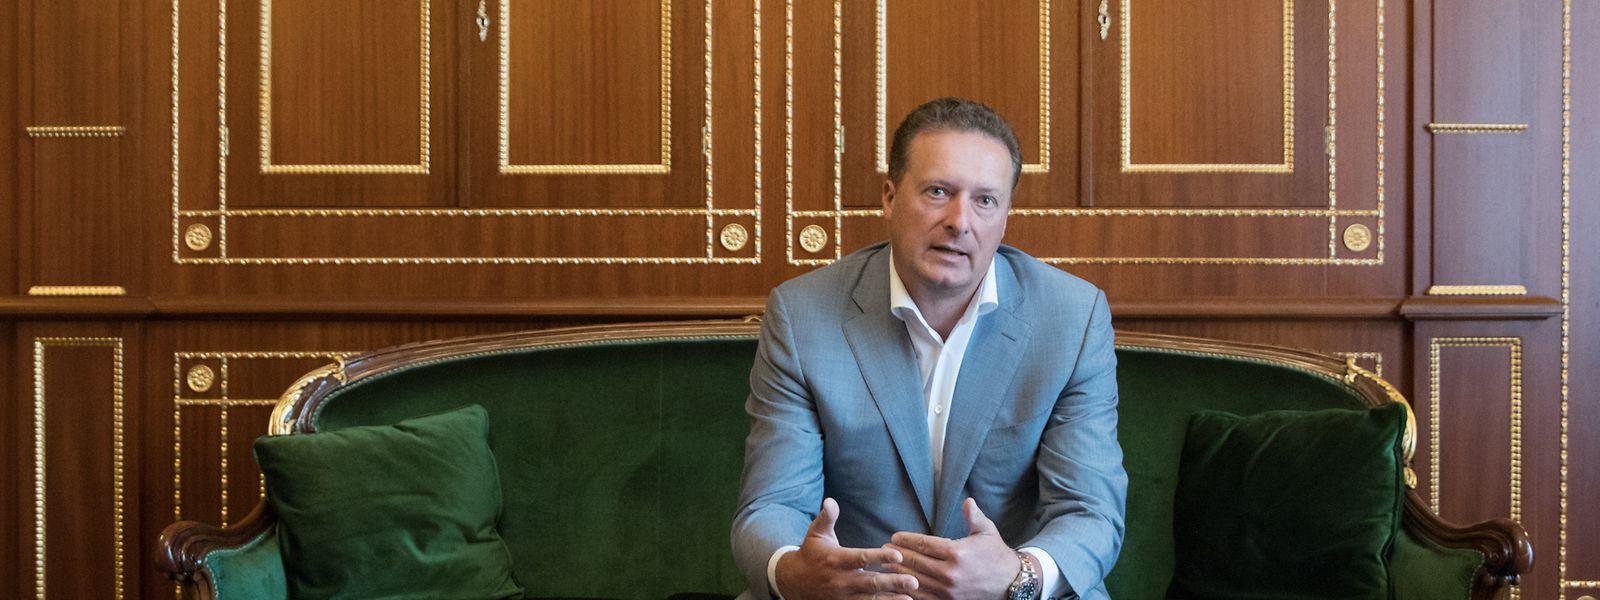 Leitet die EWUB seit 2019: Sergej Ptschelintsow (engl. trans.: Sergey Pchelintsev)